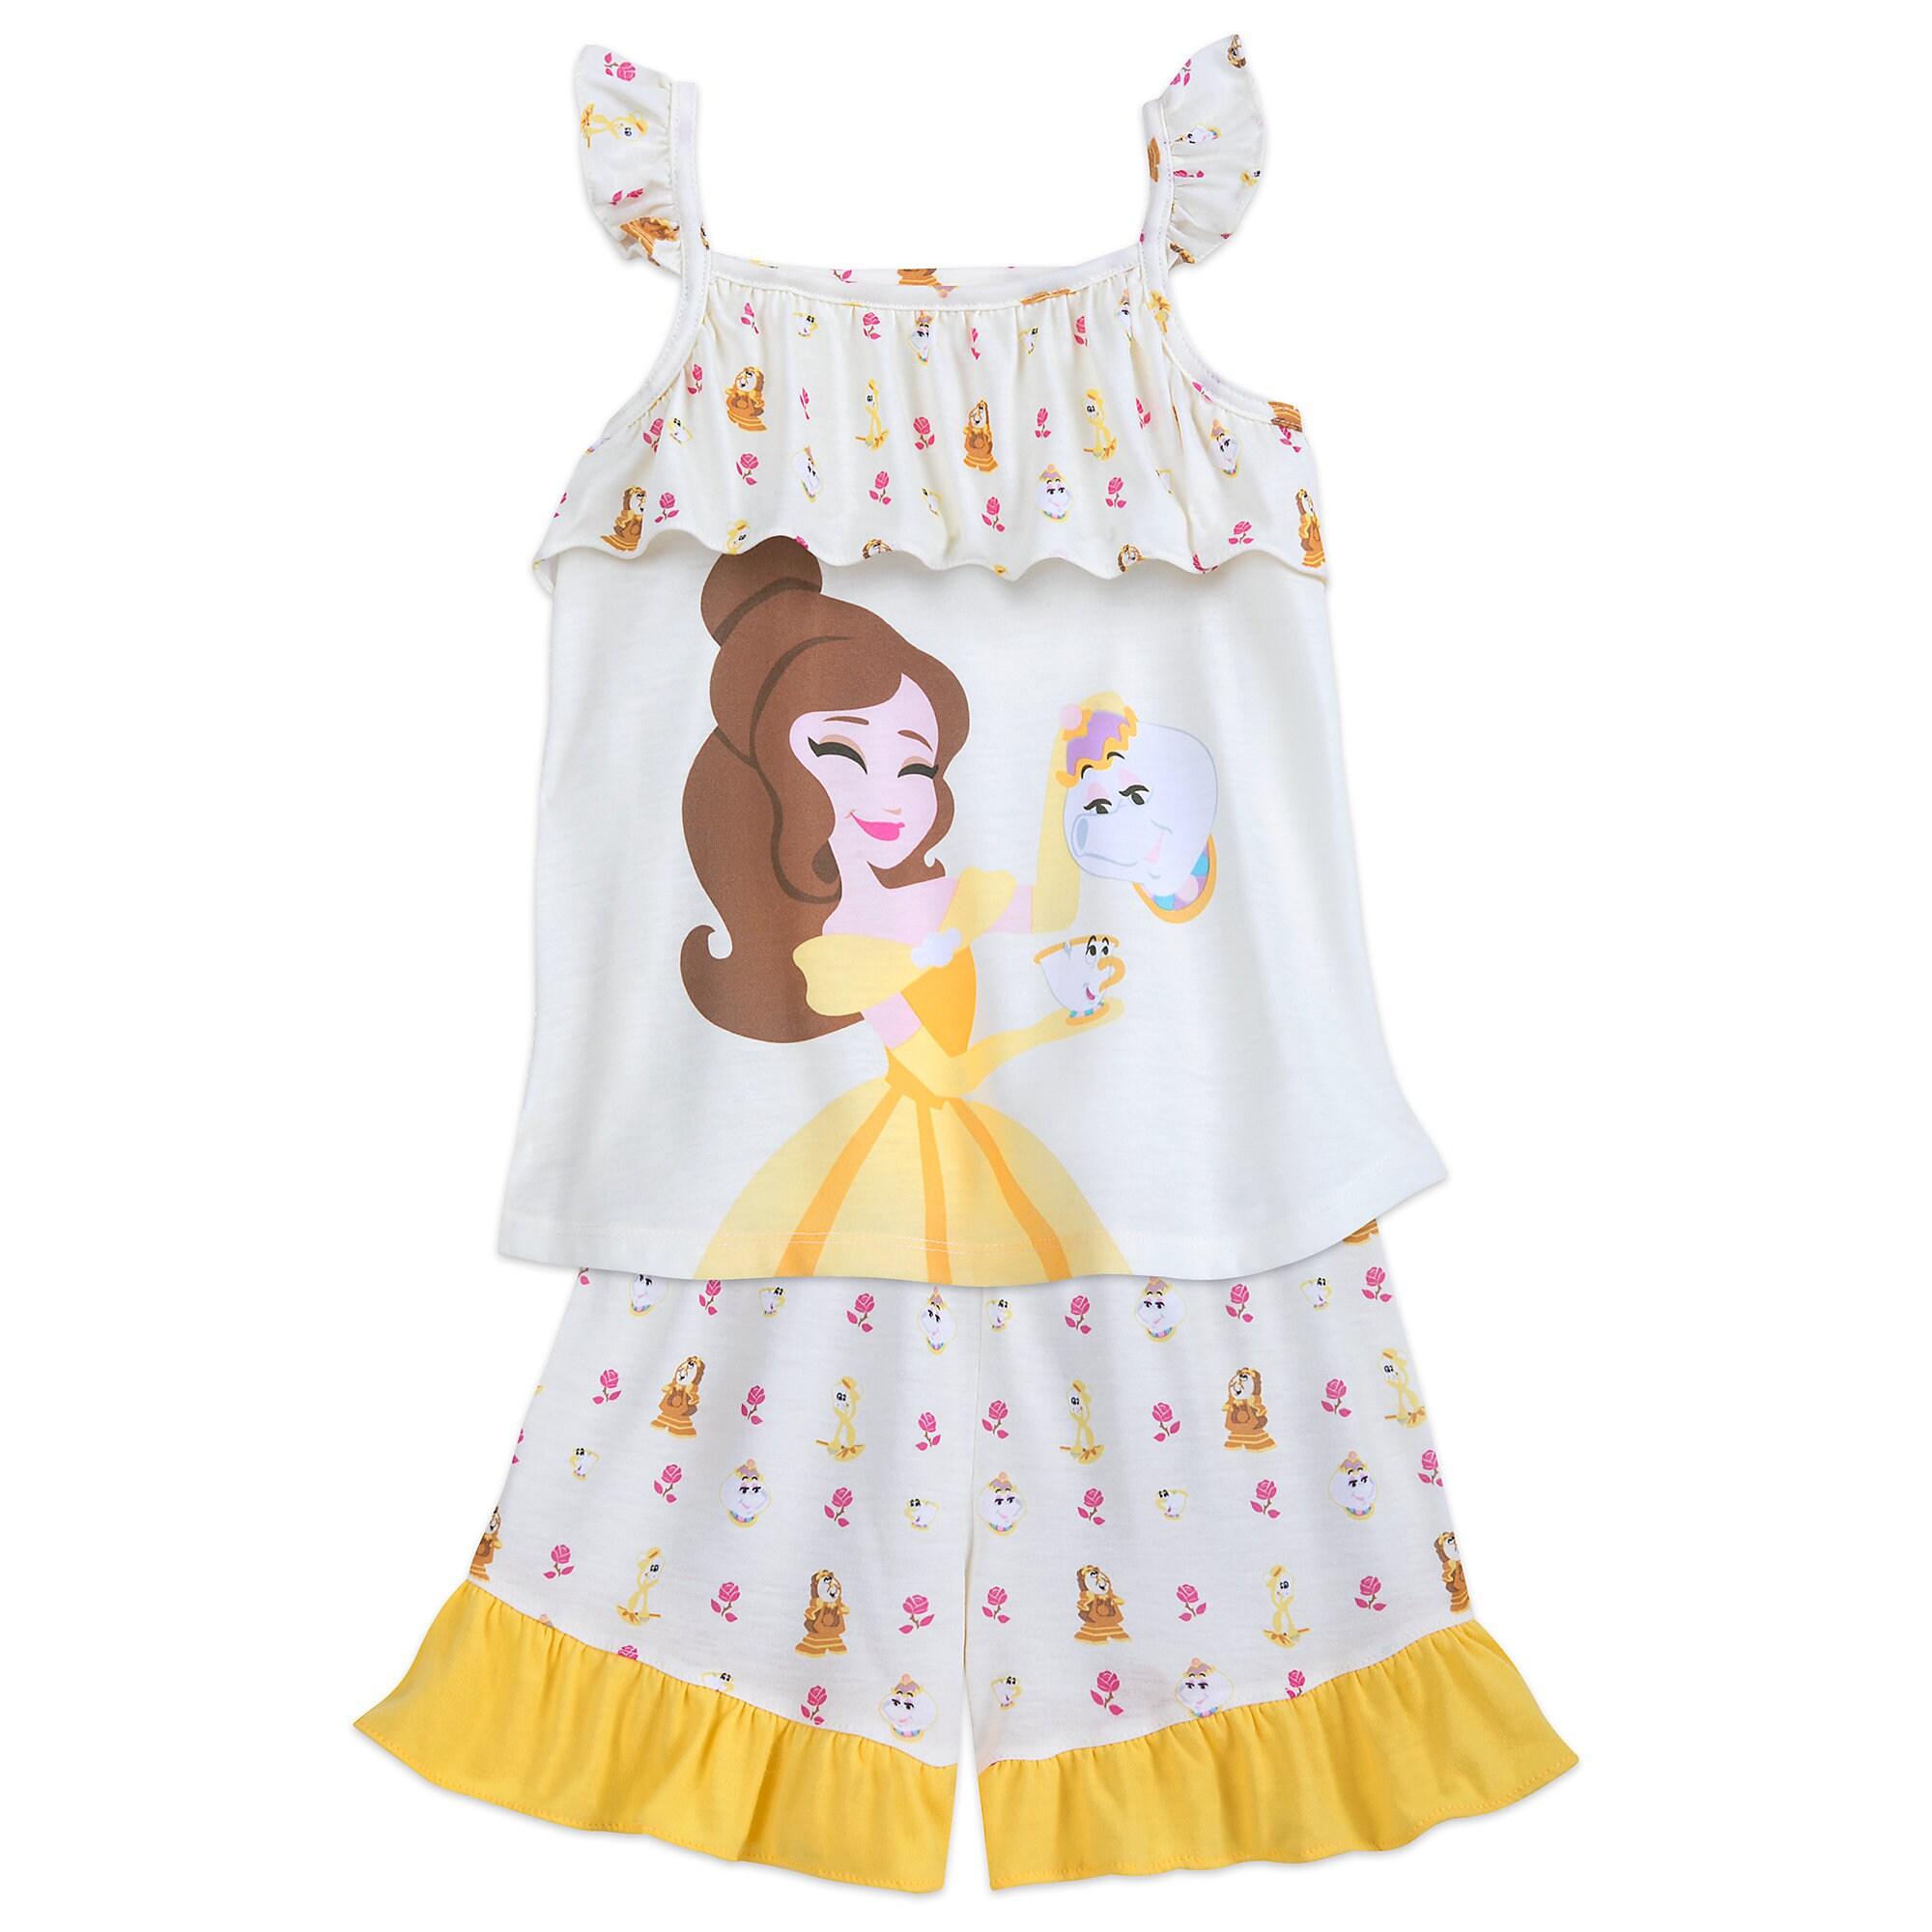 Belle Pajama Set for Girls